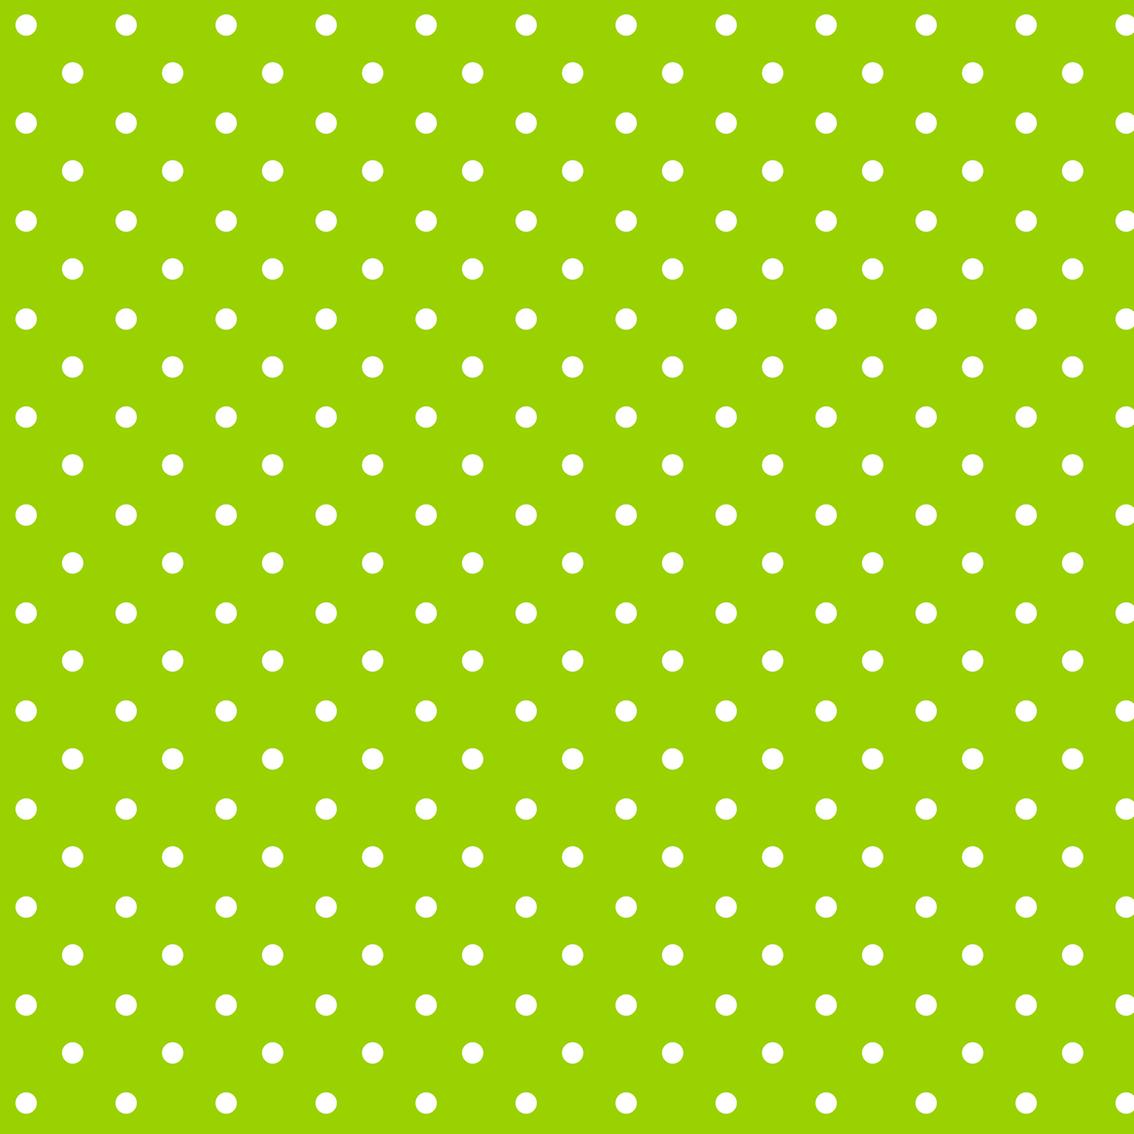 free polka dot srapbooking paper baby shower card ausdruckbares bastelpapier freebies. Black Bedroom Furniture Sets. Home Design Ideas